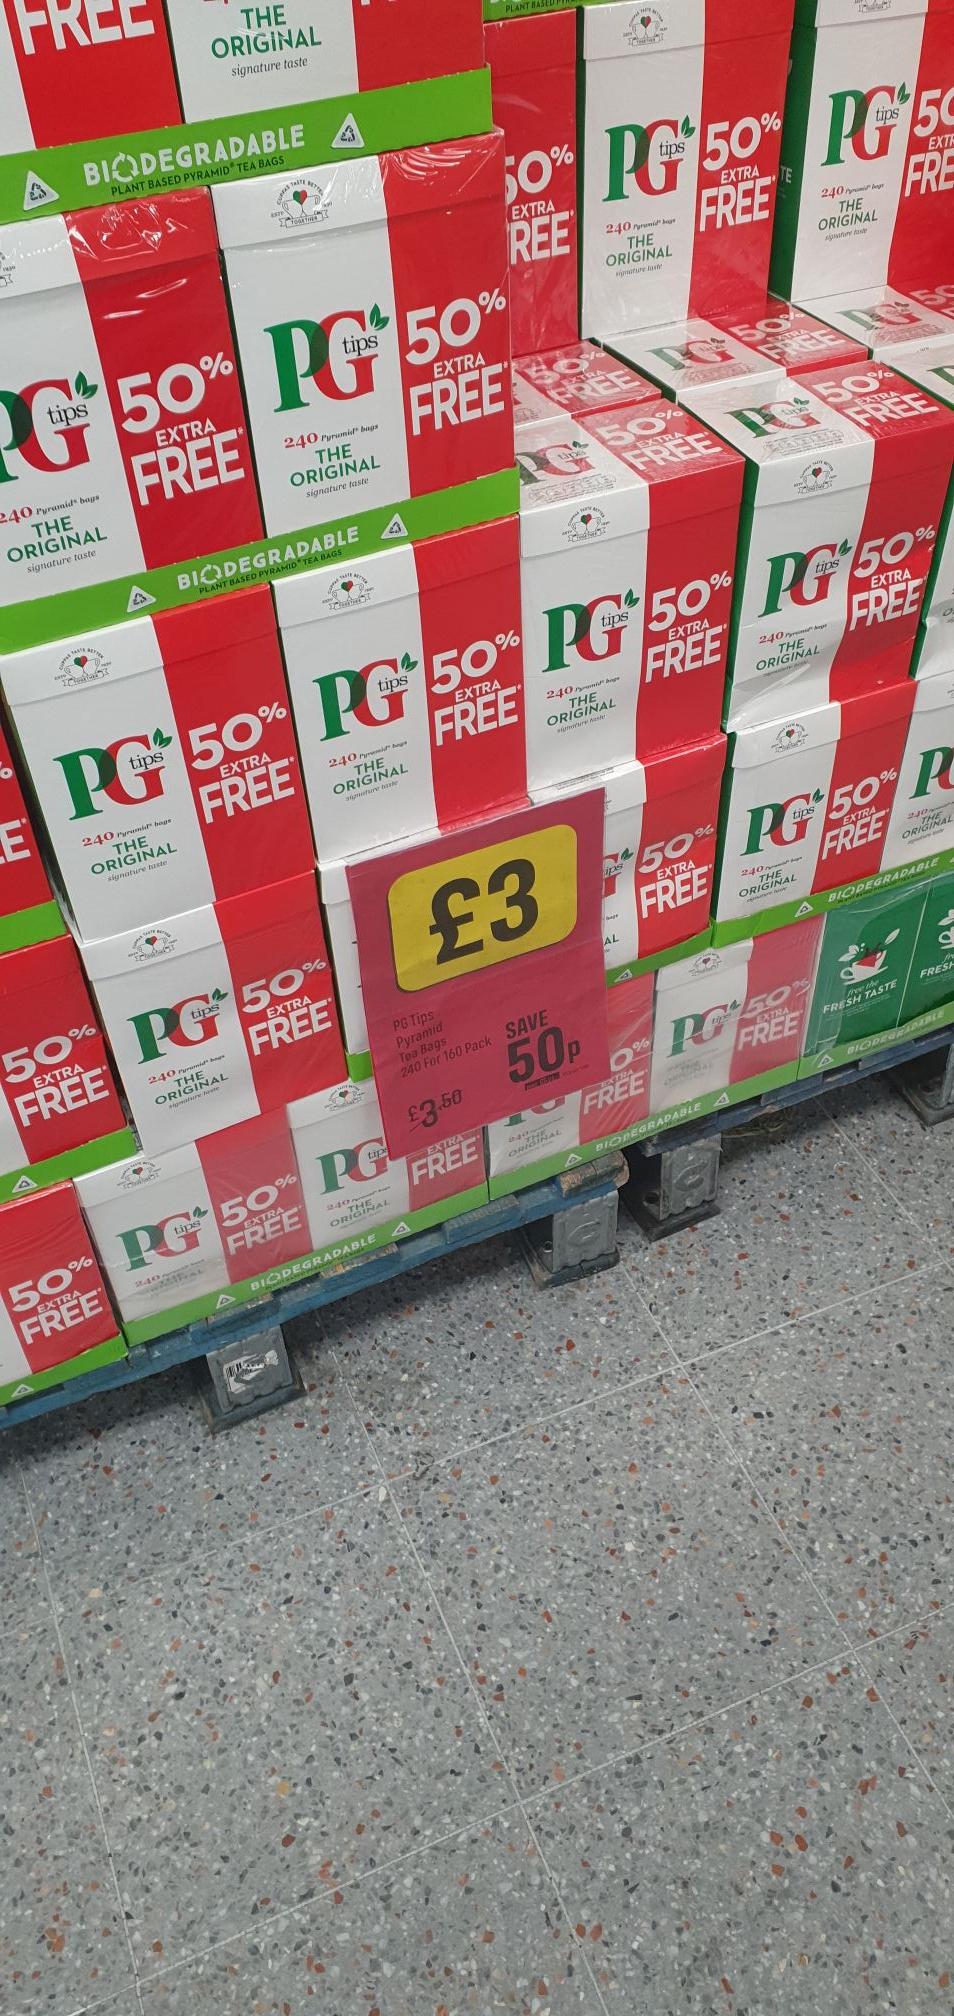 PG Tips (240 Bags) - £3 Instore/Online @ Iceland